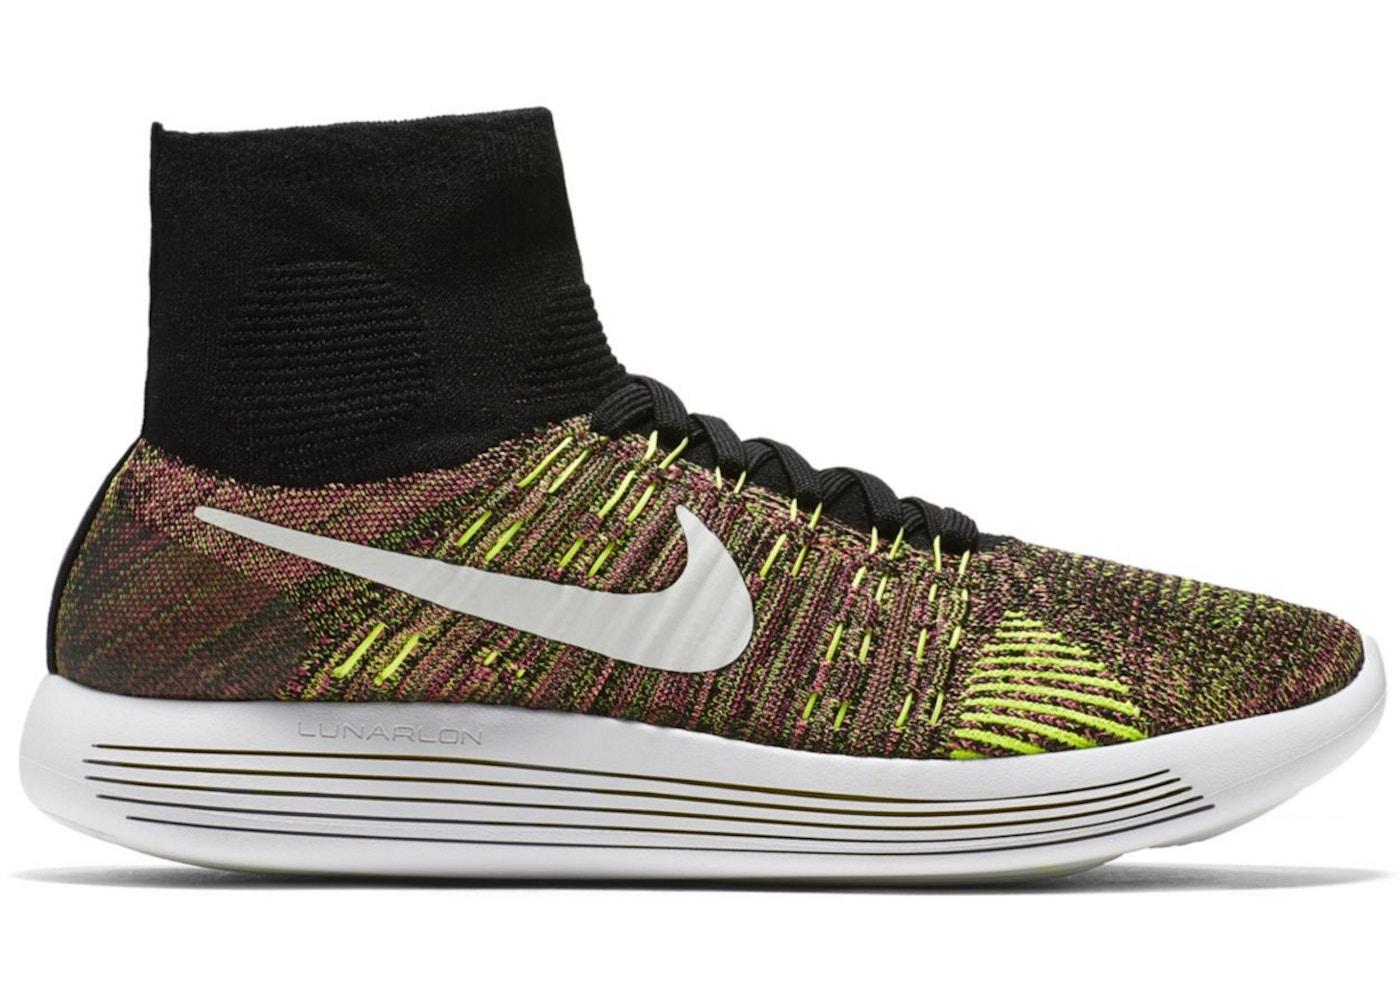 designer fashion 8ba38 6aad8 Nike LunarEpic Flyknit Unlimited - 844860-999